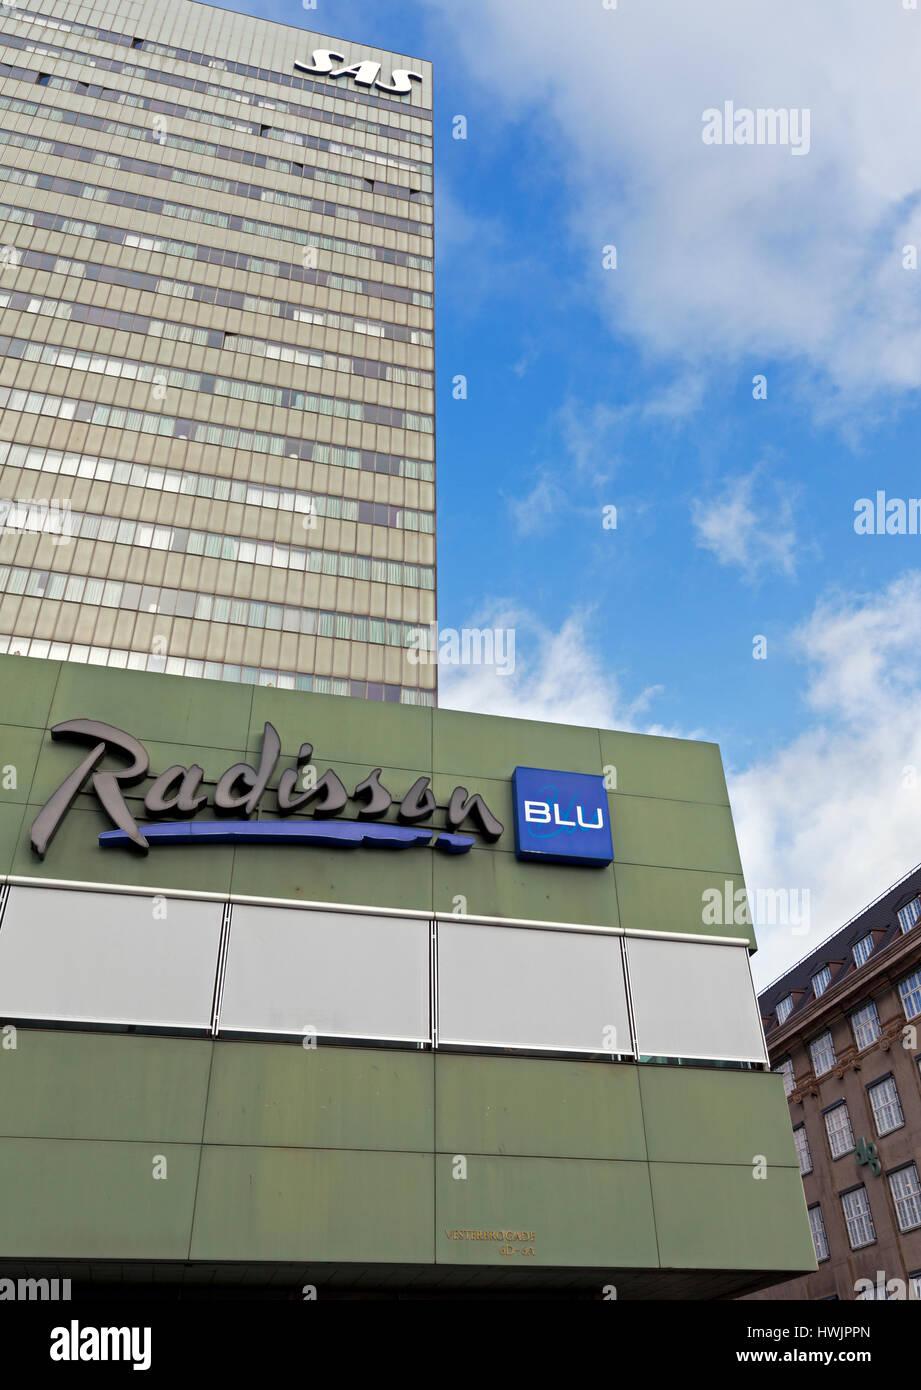 The Radisson Blu Royal Hotel, the SAS Hotel, Vesterbrogade, central Copenhagen, Denmark. - Stock Image